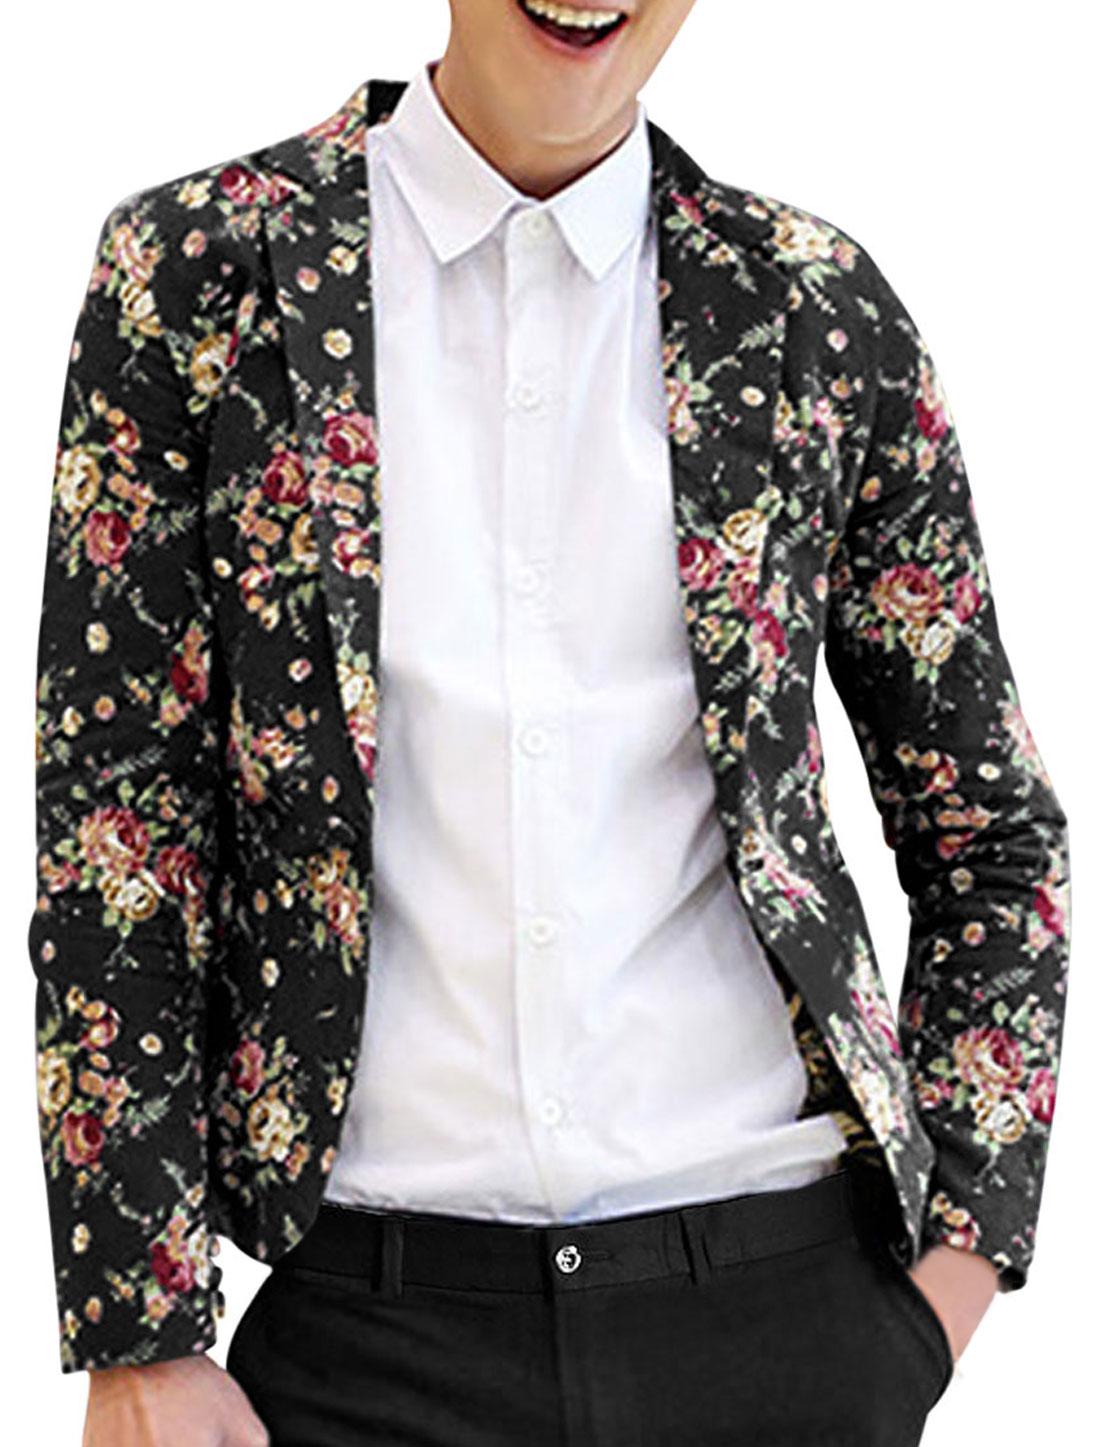 Men Notched Lapel Allover Floral Print Back Vent Stylish Linen Blazer Black M